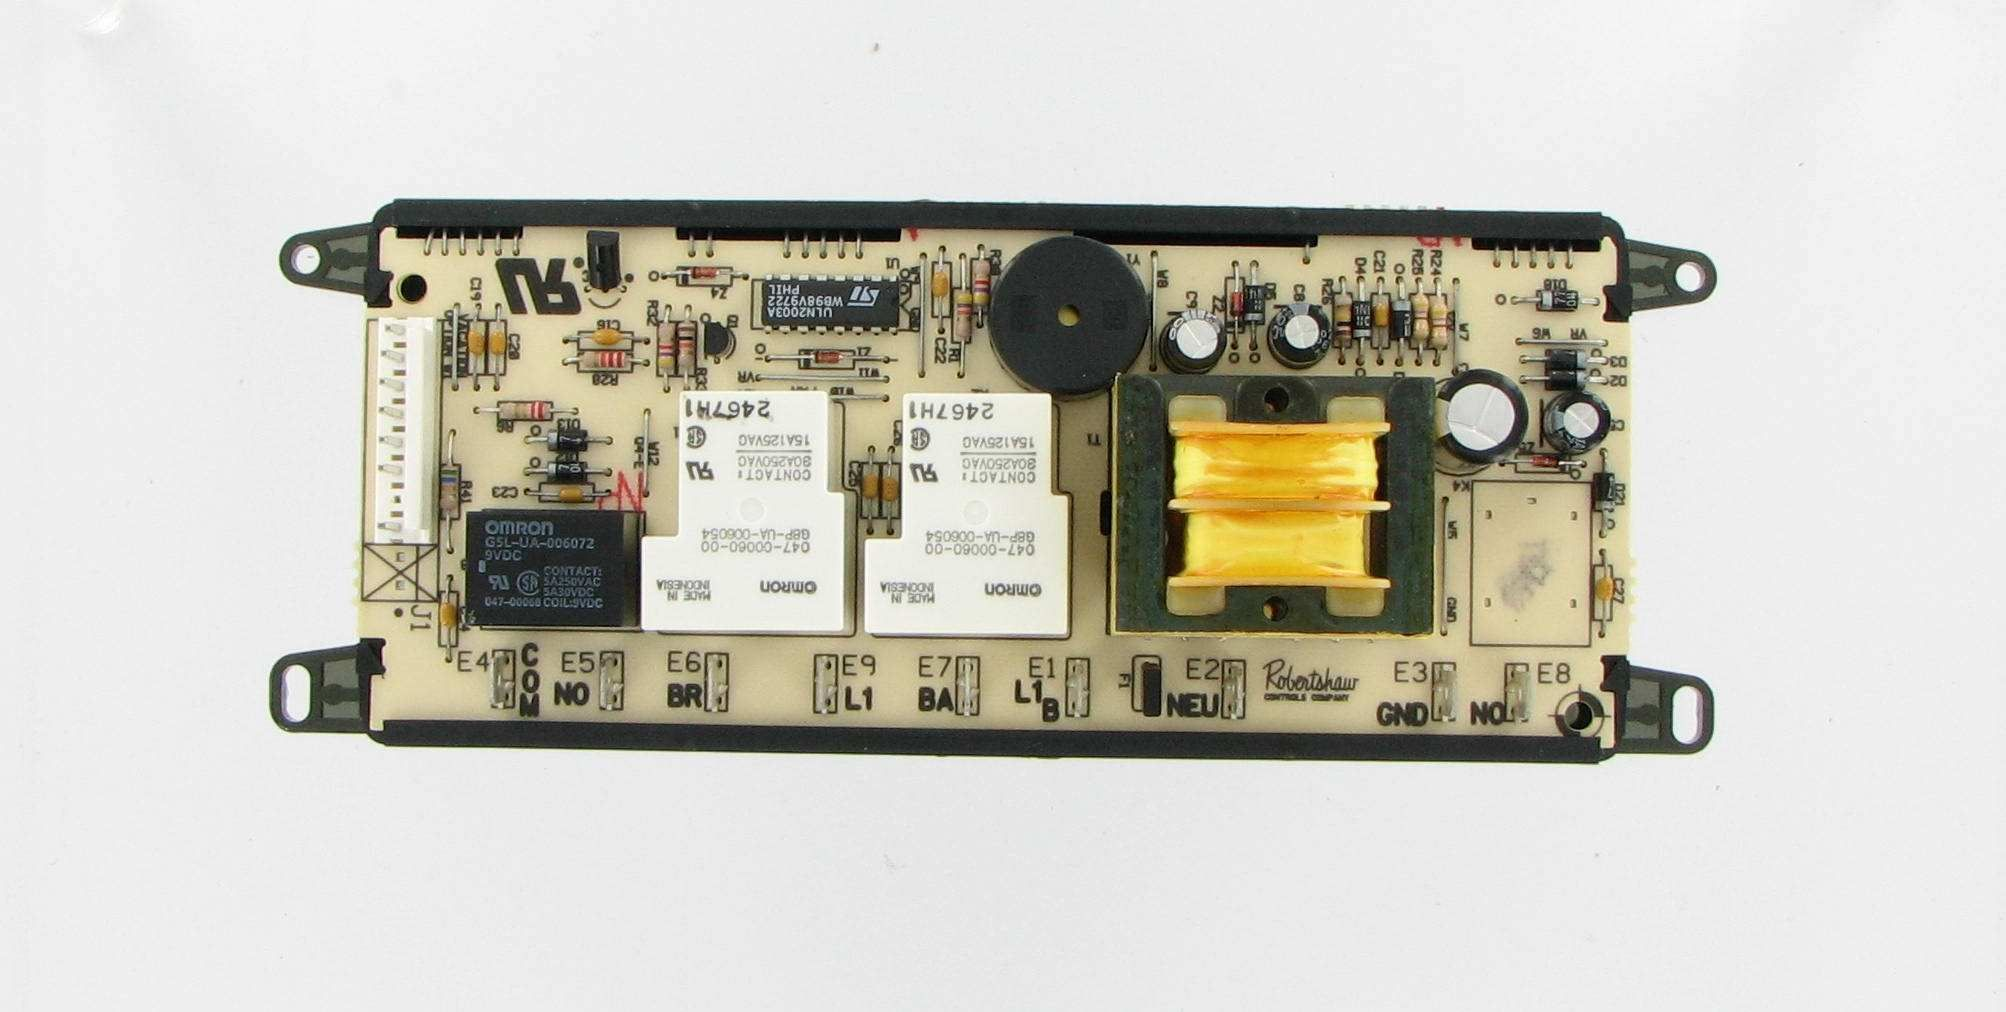 #Frigidaire / #Kenmore / #Sears #316080100 Oven Control Board Repair Service